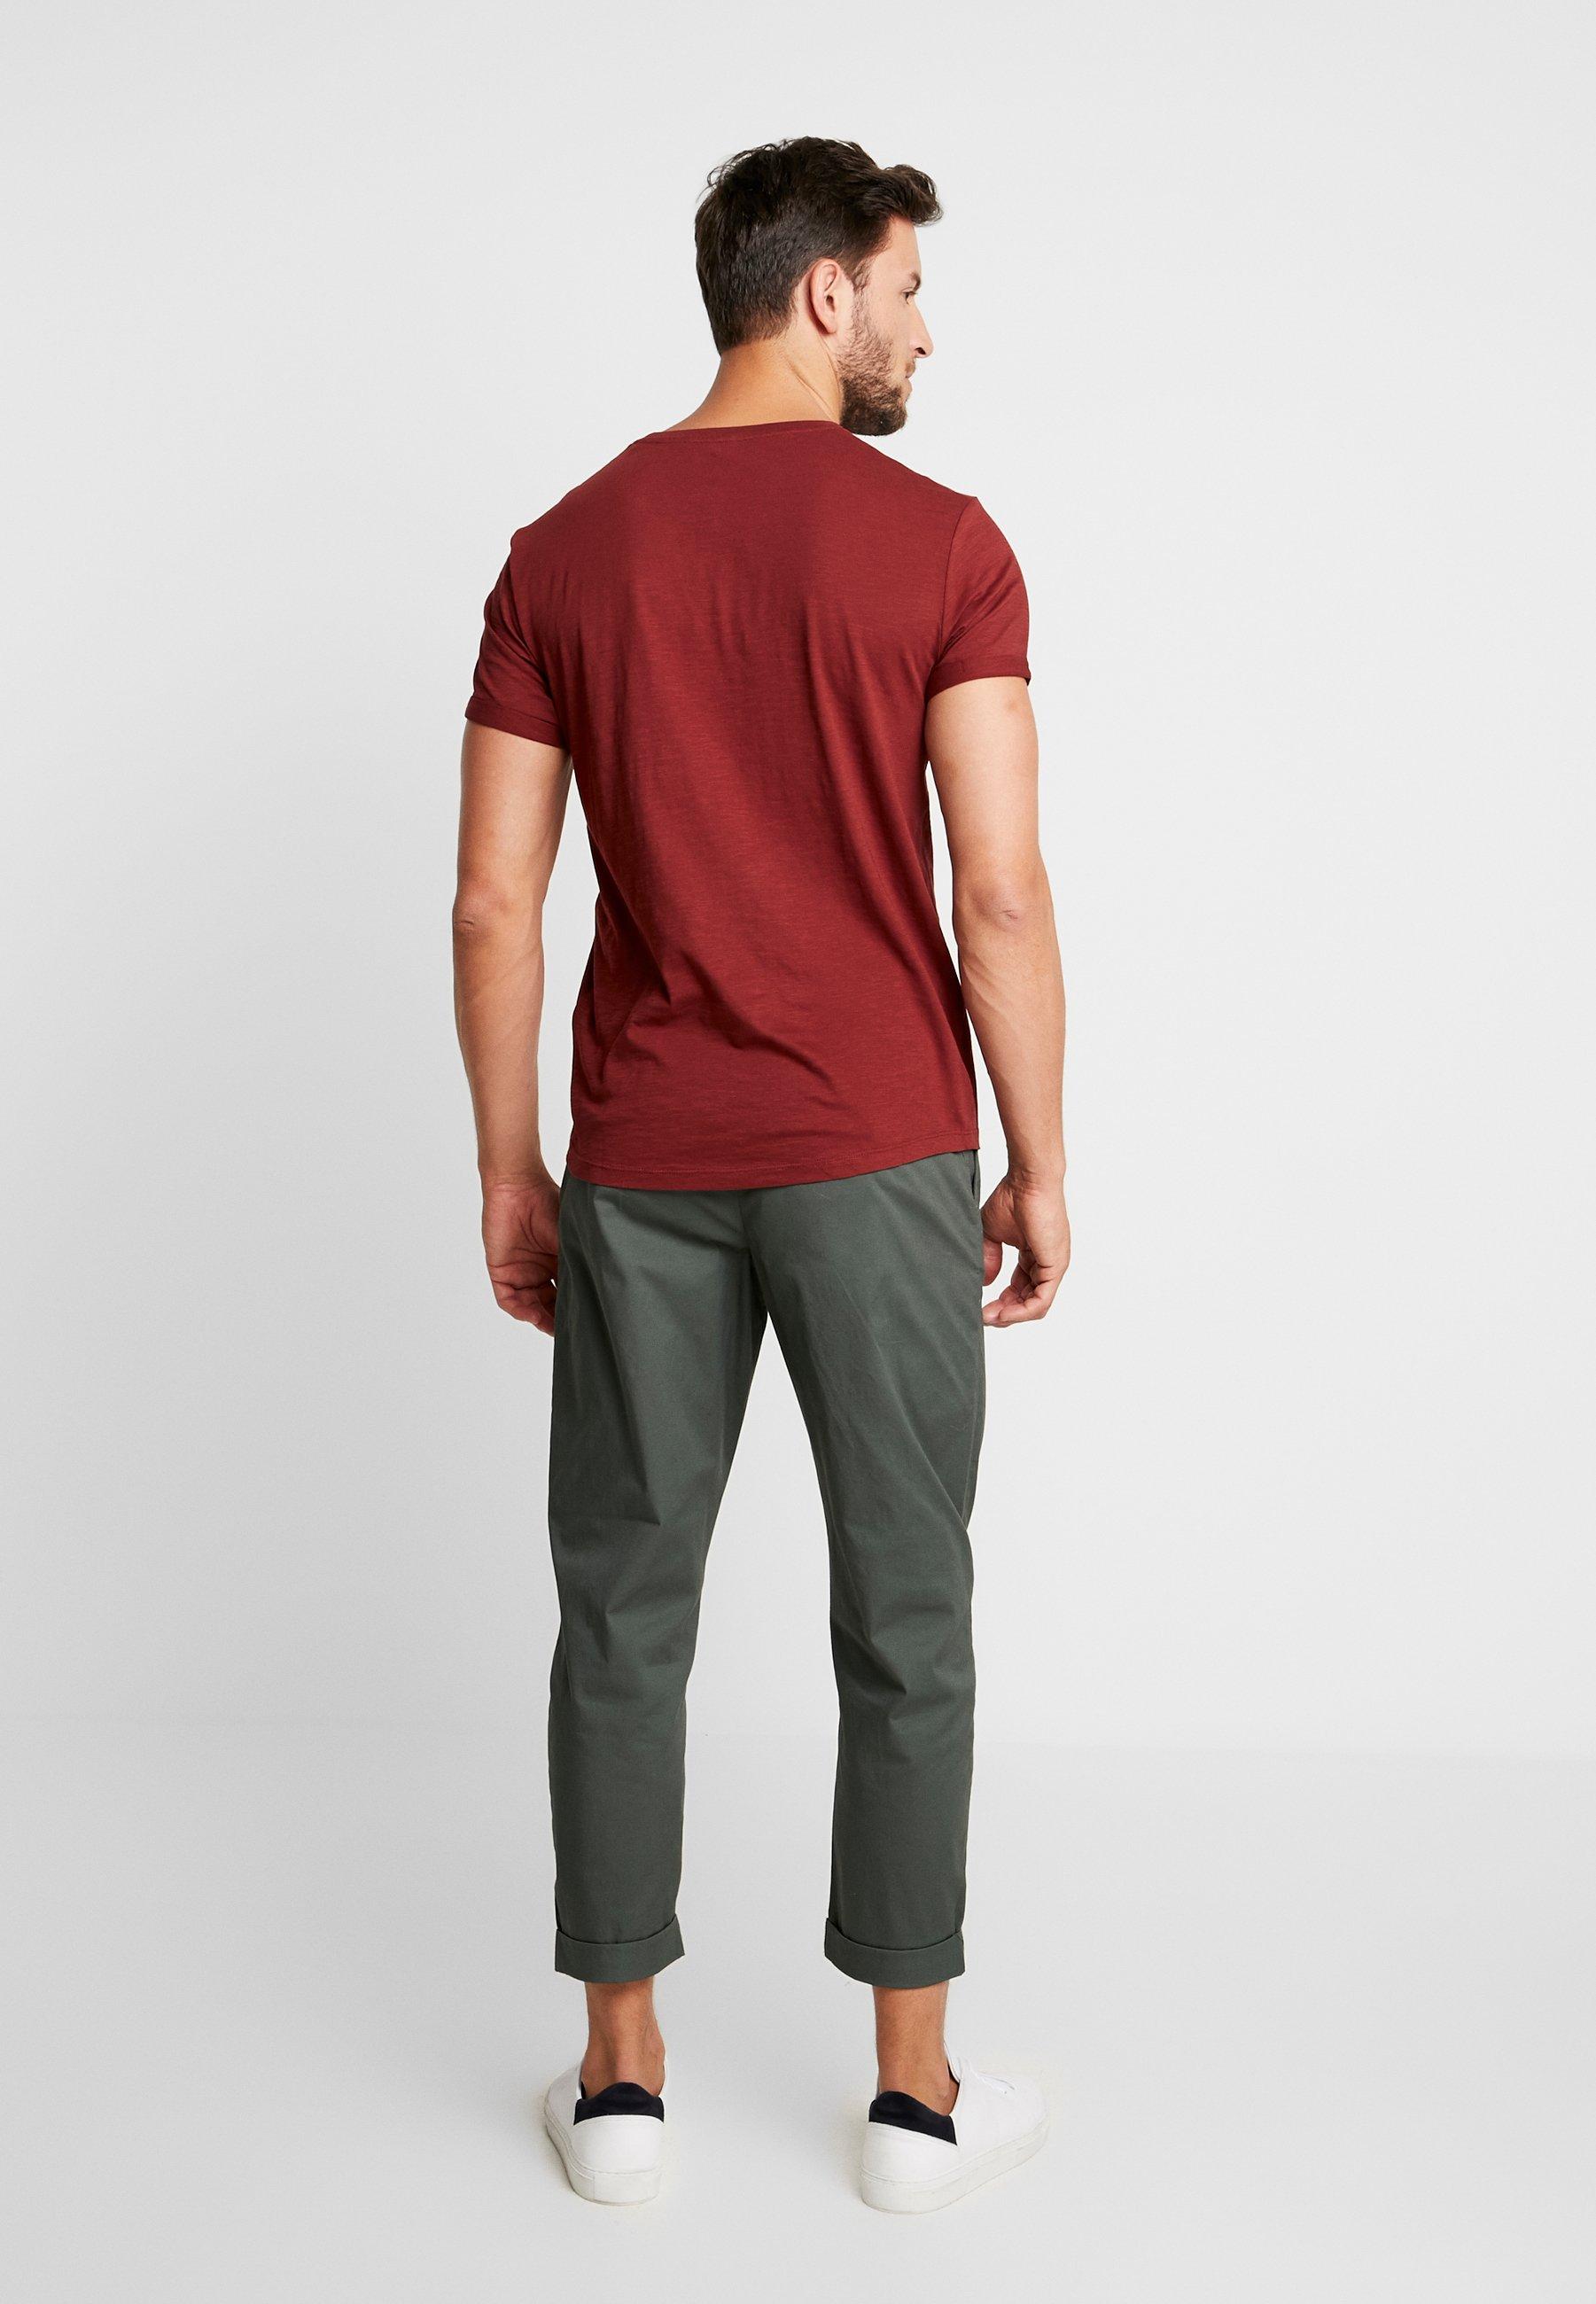 By Esprit Core Edc Basique TeeT Terracotta shirt IY6vm7gbfy